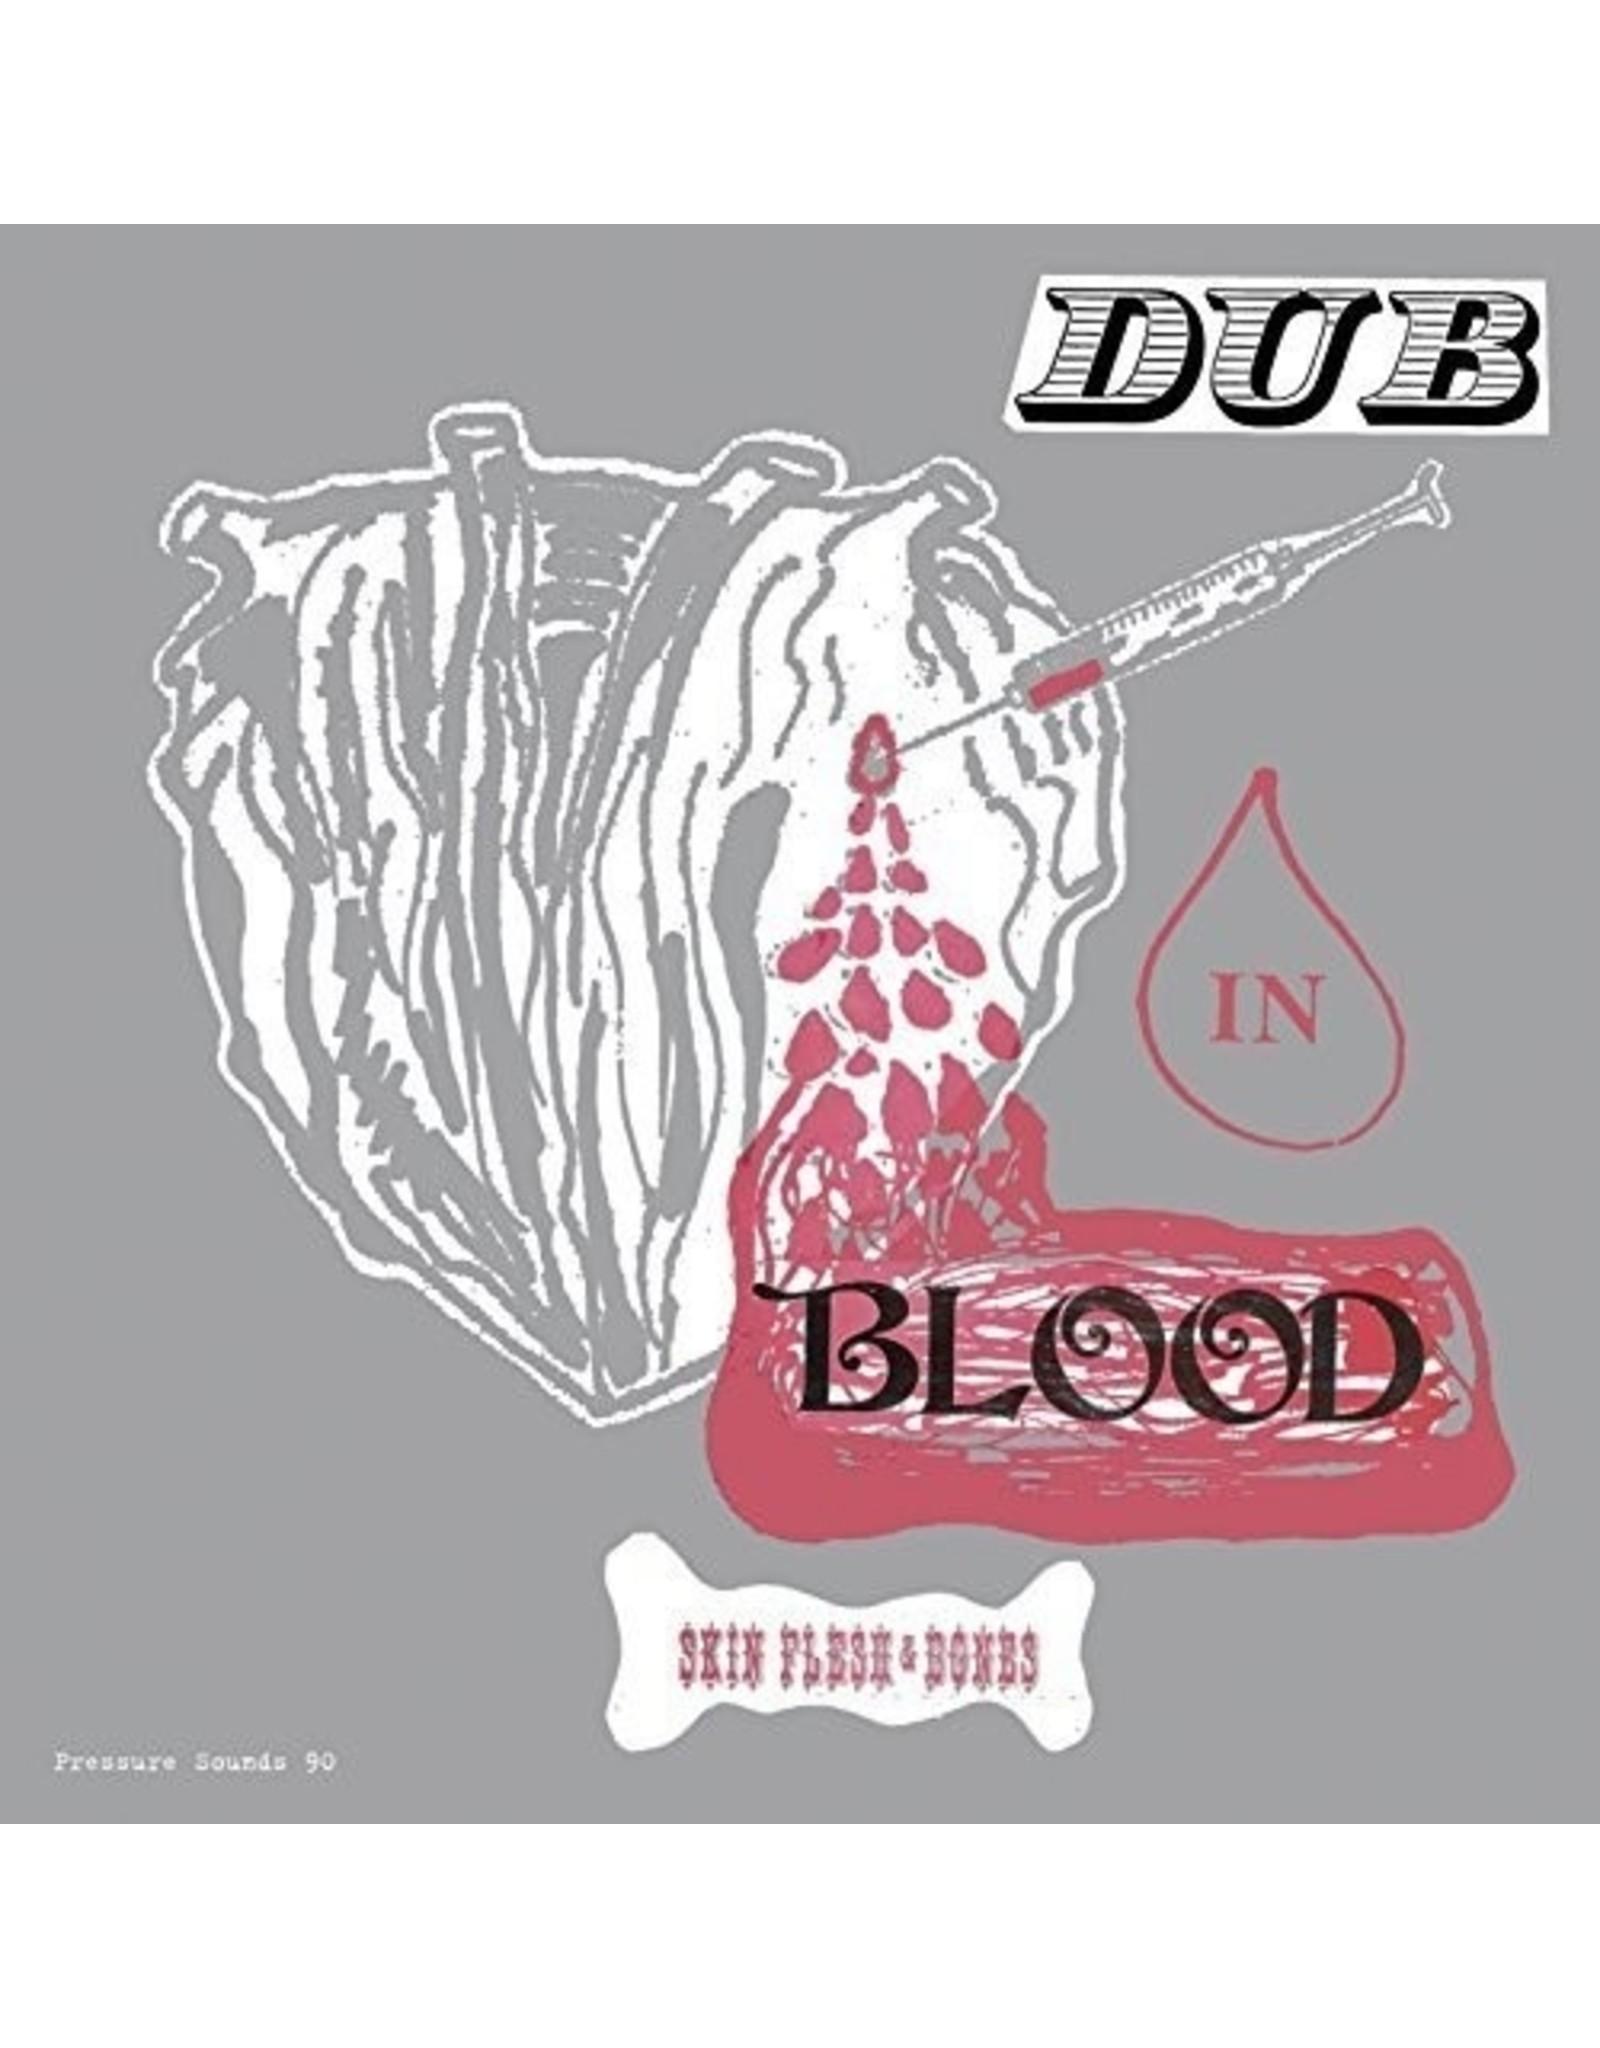 New Vinyl Skin Flesh & Bones - Dub In Blood LP